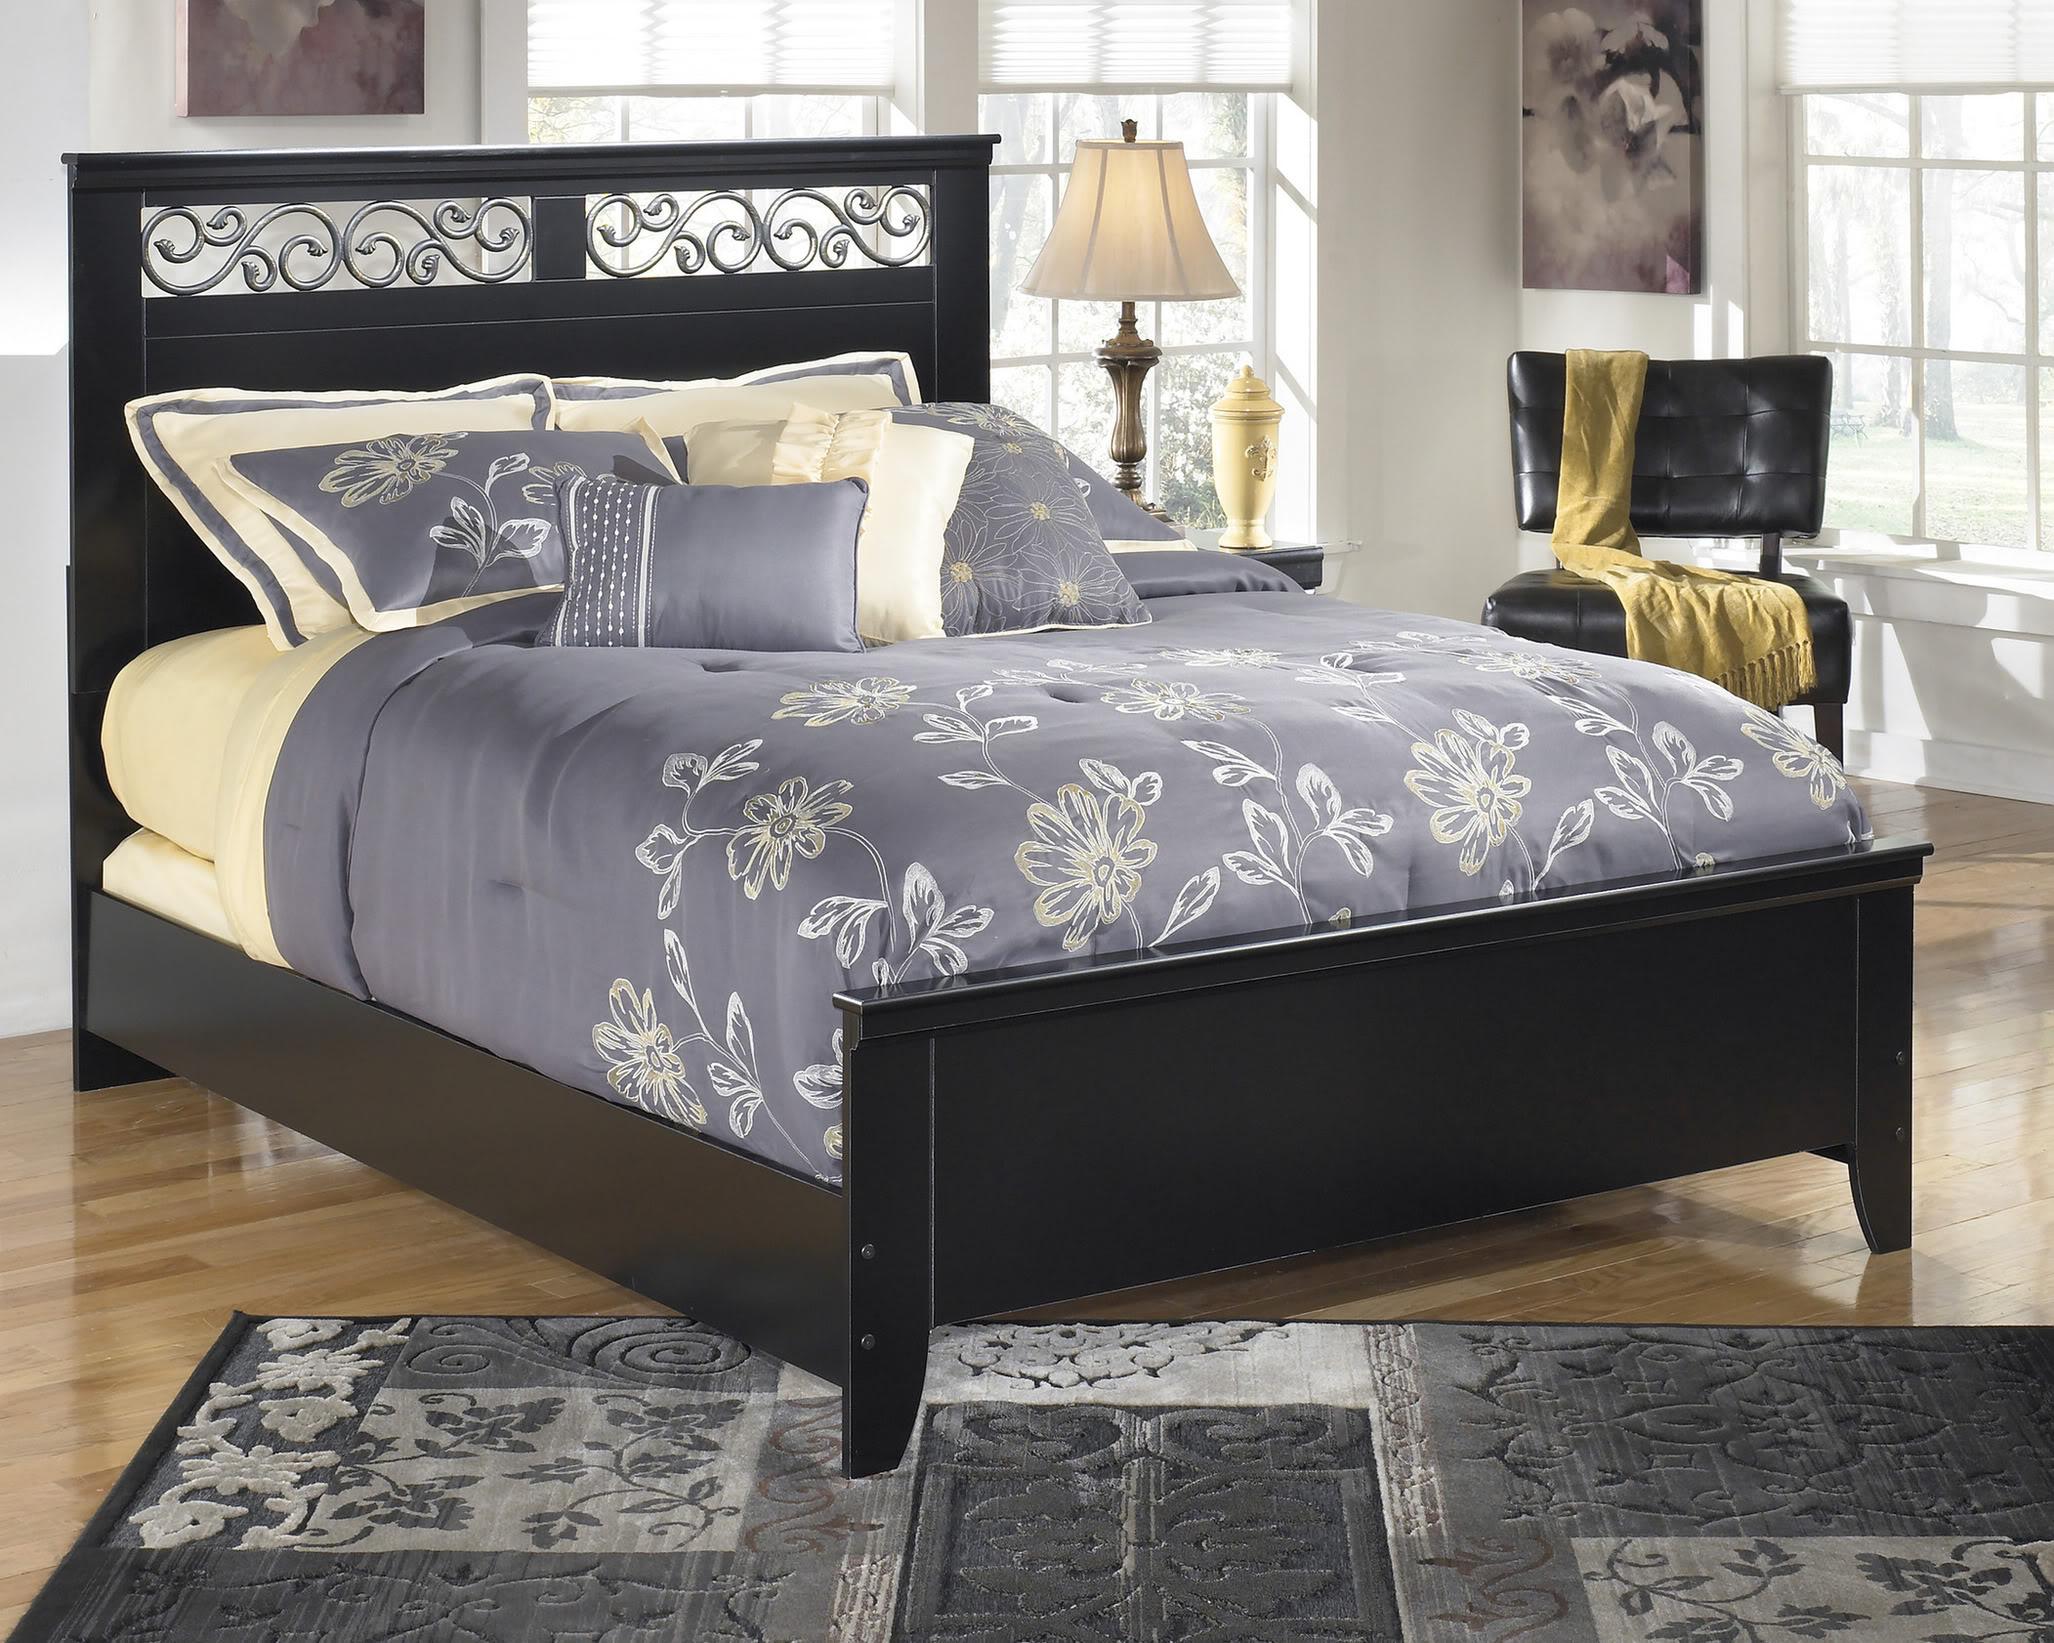 black ornate bedroom furniture photo - 3